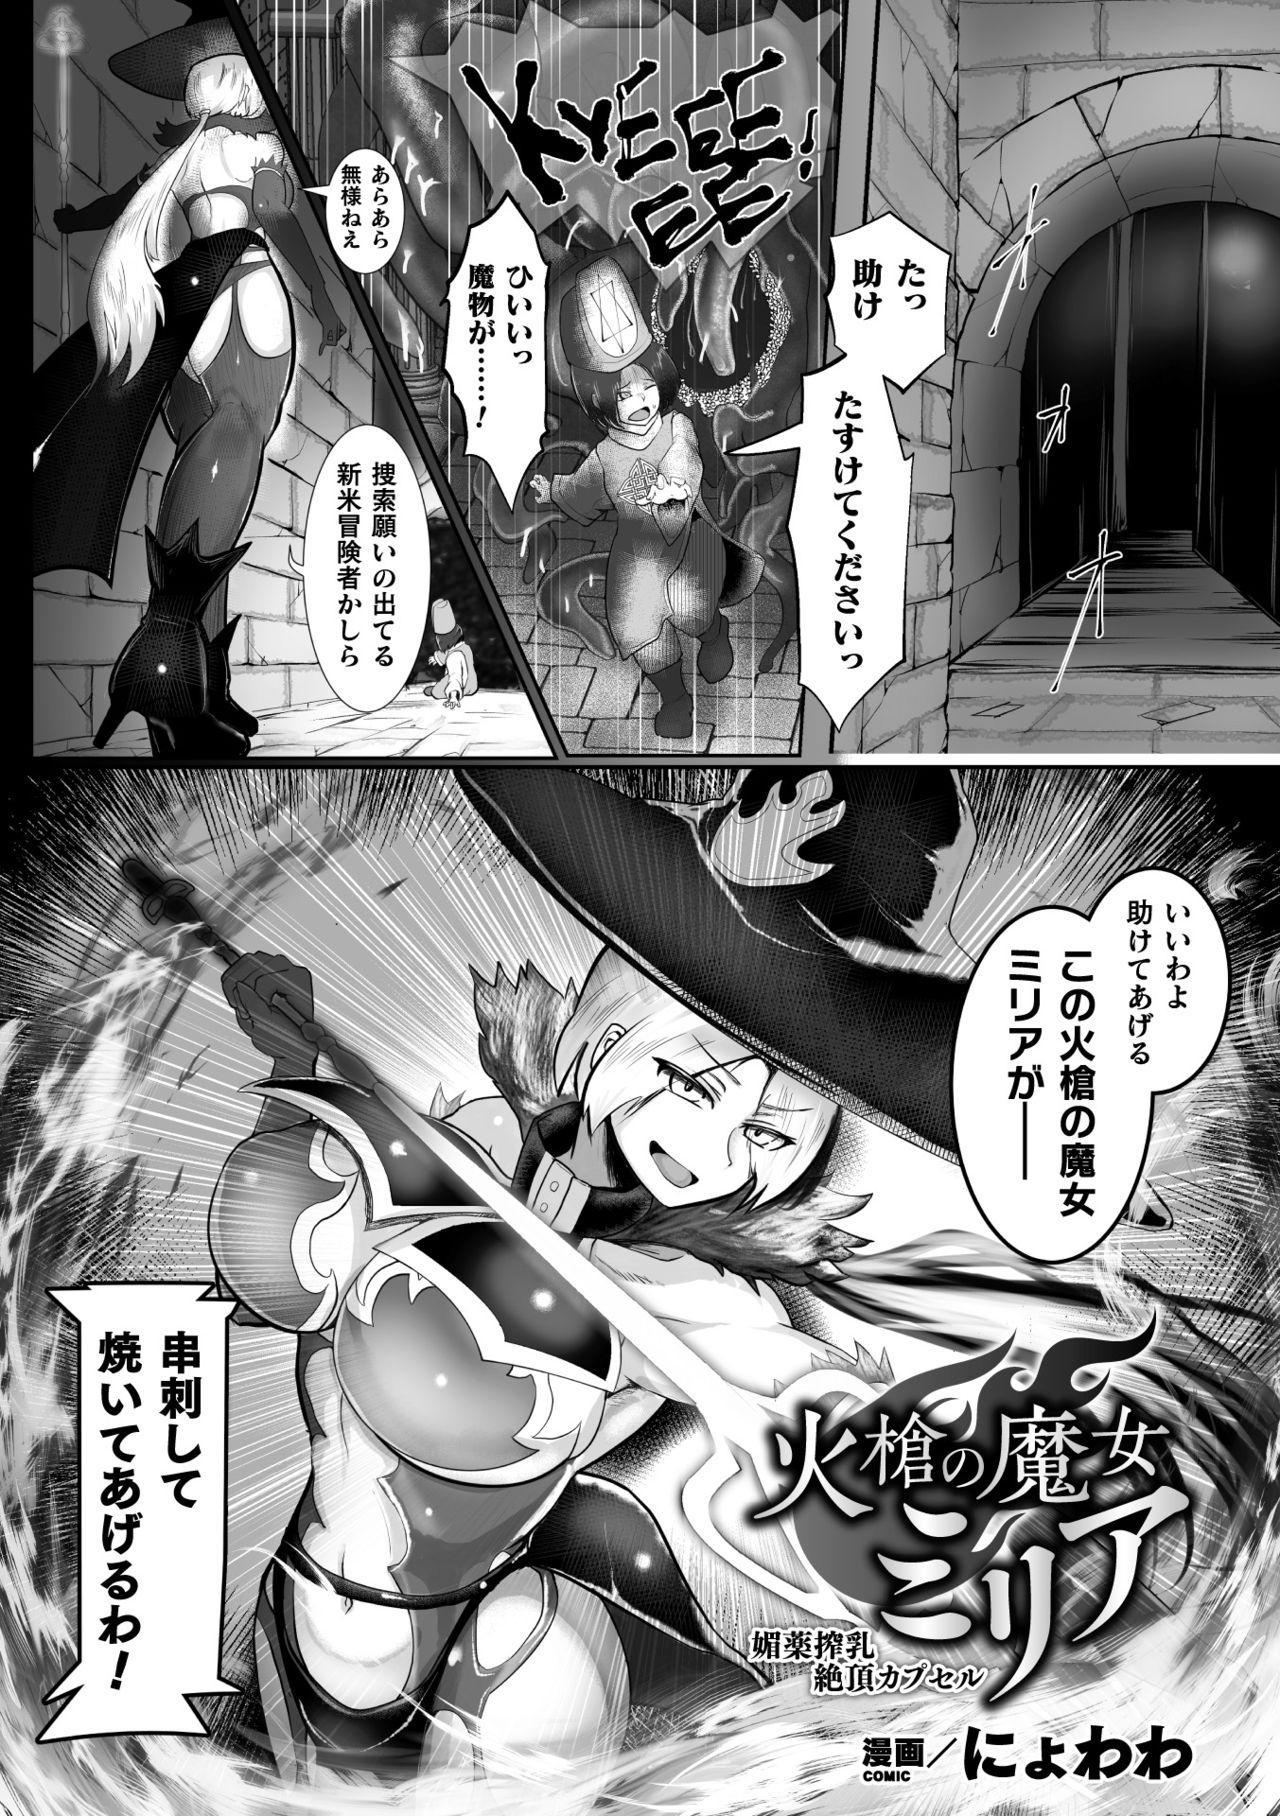 2D Comic Magazine Capsule Kan Seigi no Heroine Mesu Ochi Jikken! Vol. 2 48